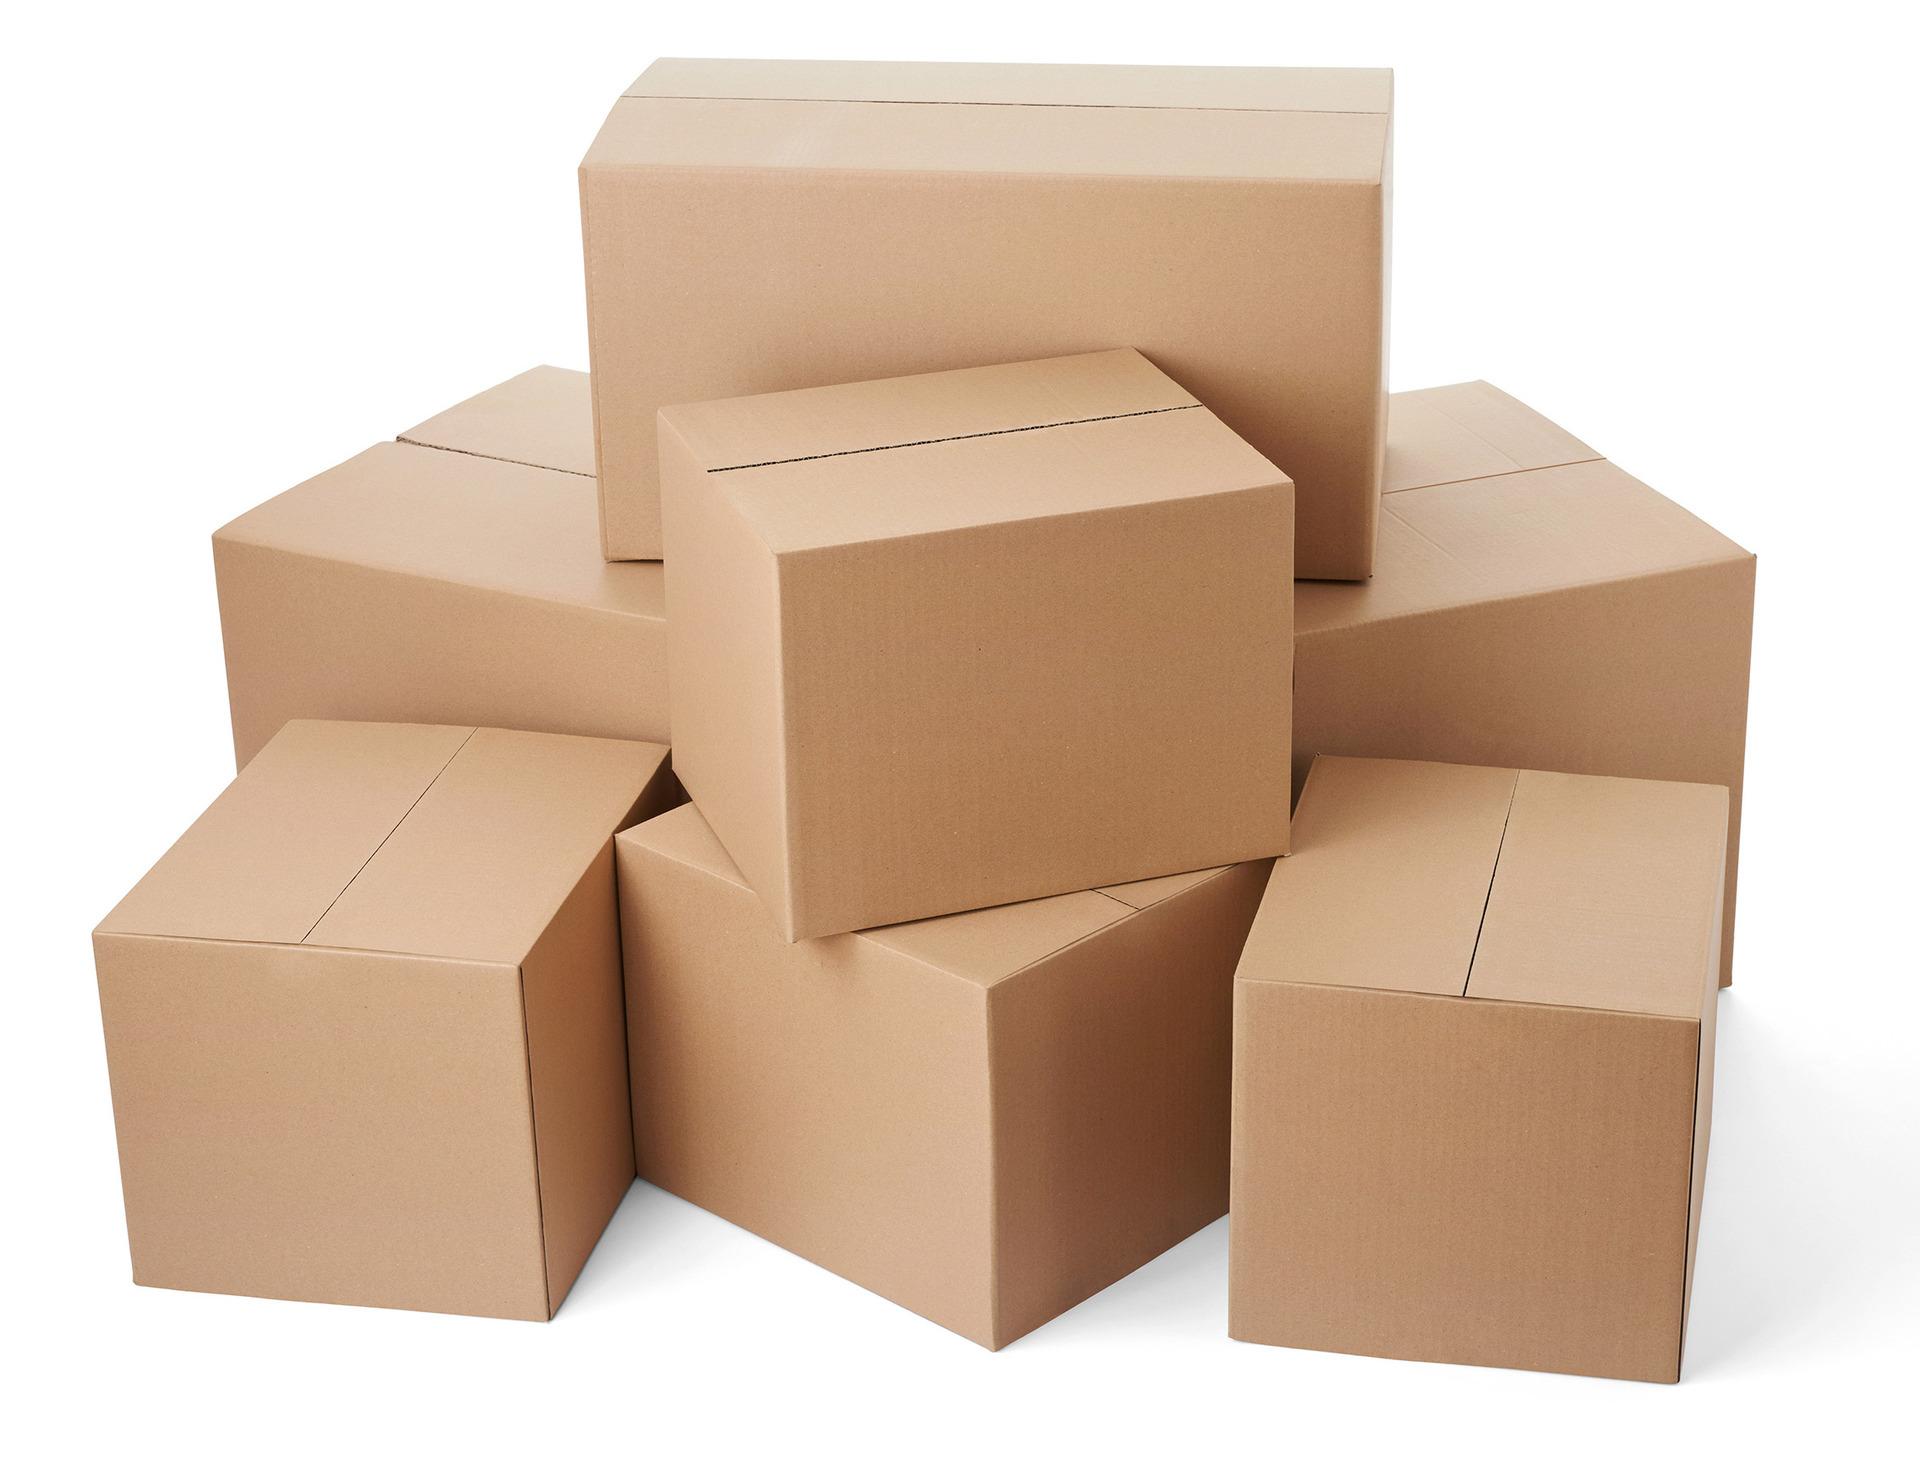 Moving Boxes Moving Boxes-Moving Boxes Moving Boxes-12